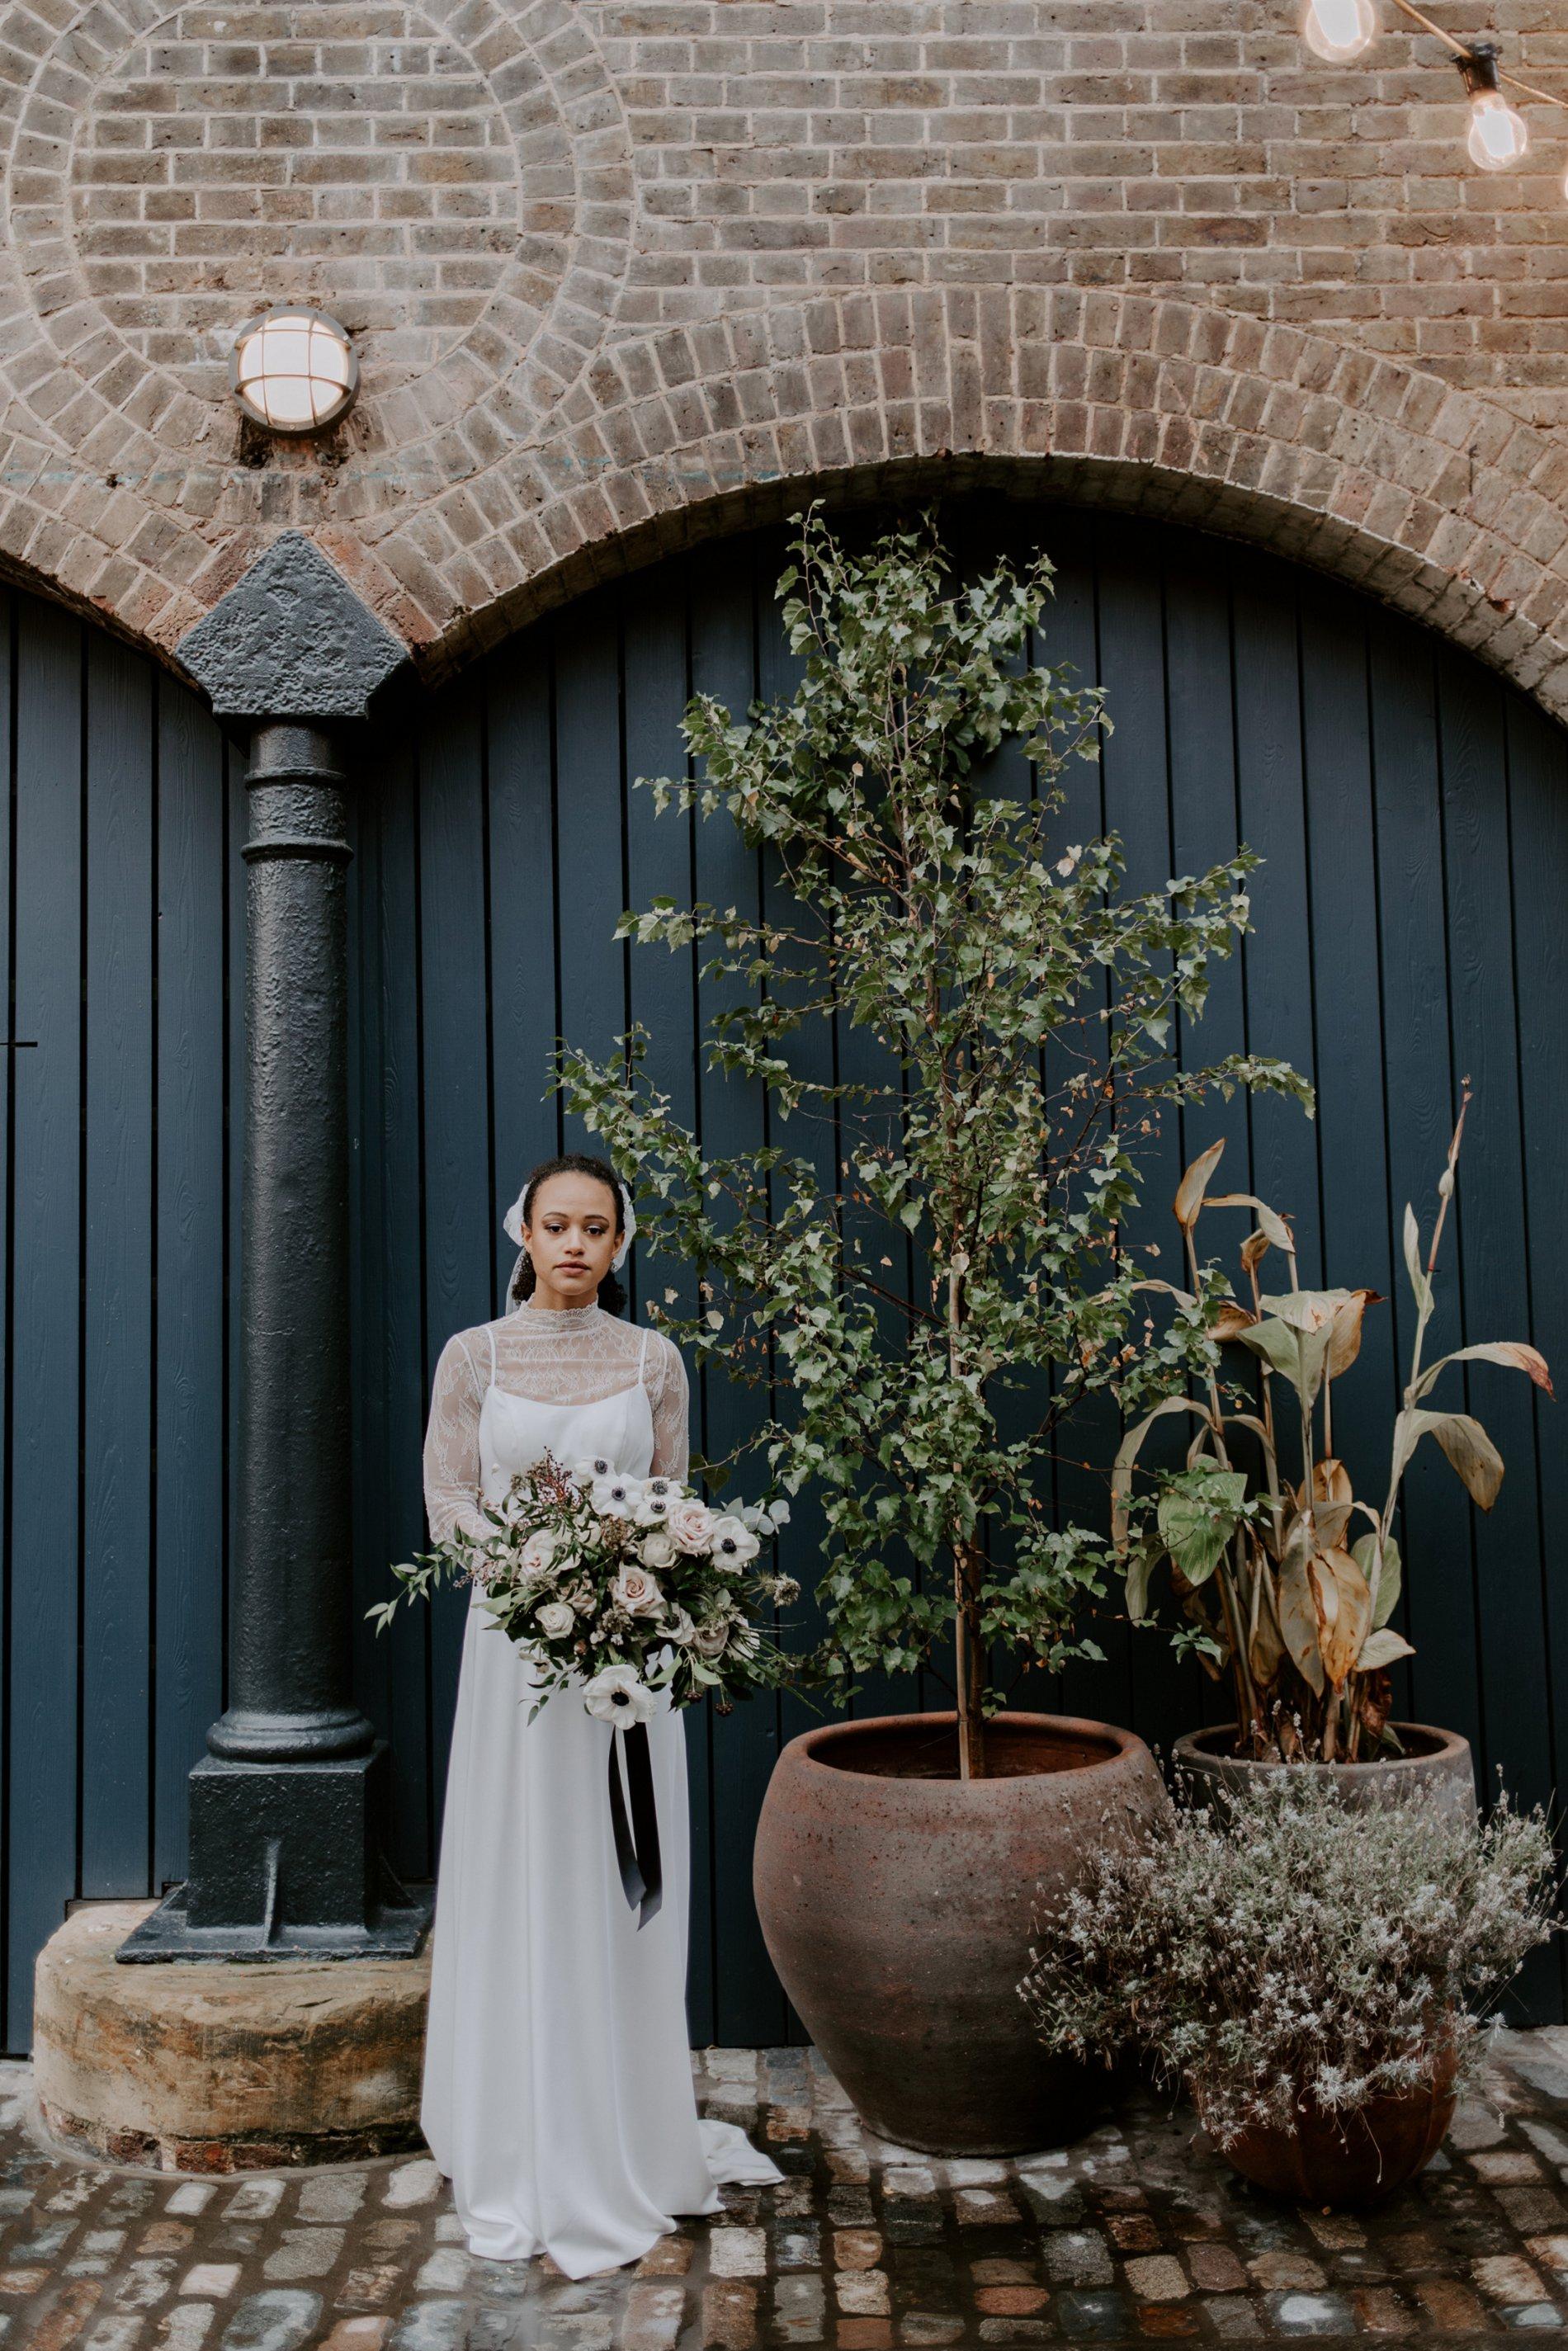 City Wedding Styled Shoot at Coal Drops Yard (c) Emztography (6)